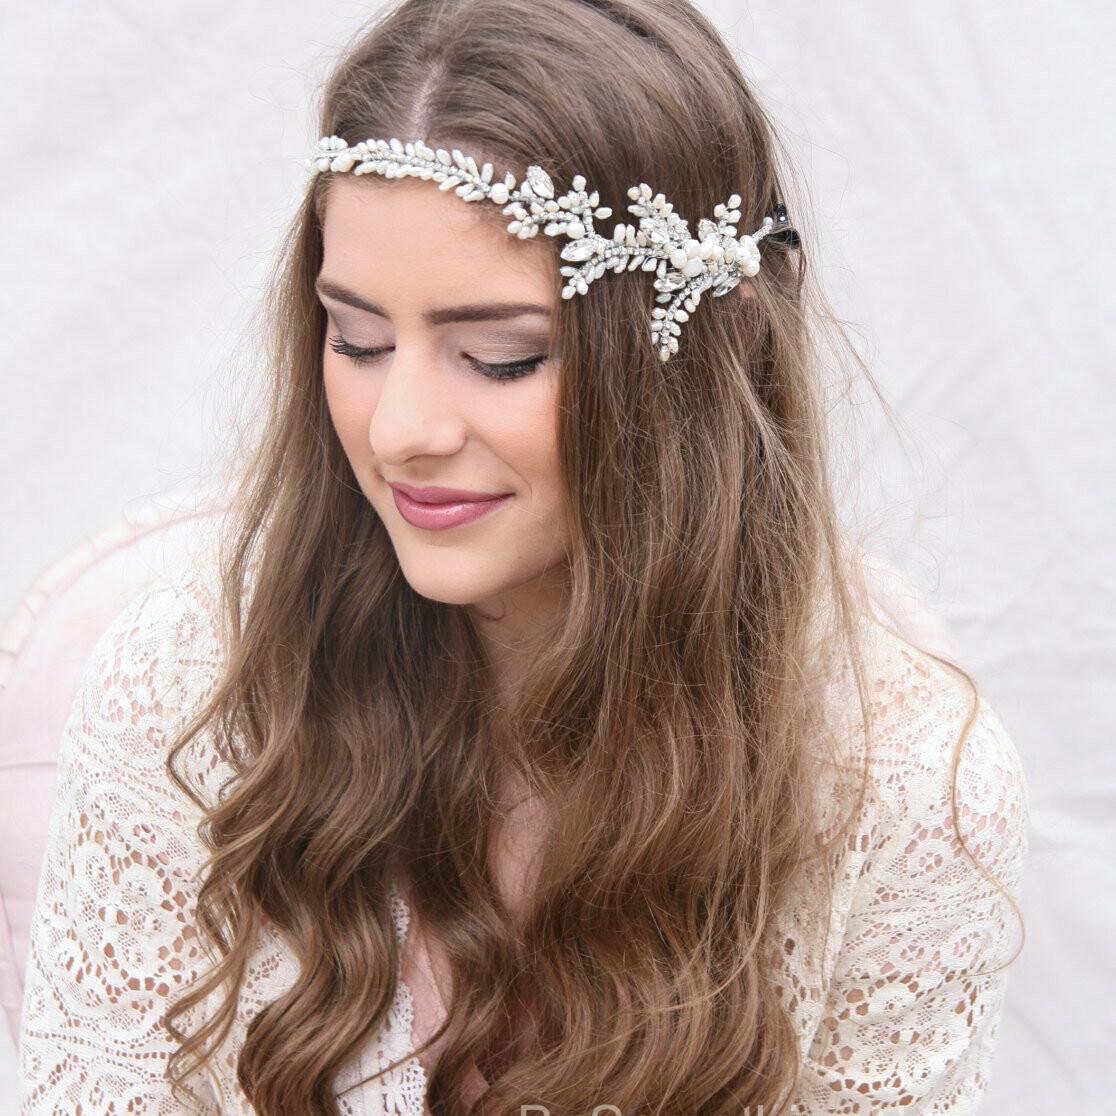 Bridal gold halo Gold hair vine Wedding leaves hair vine Bridal leaf headband Rhinestone wedding golden headress Brass headpiece